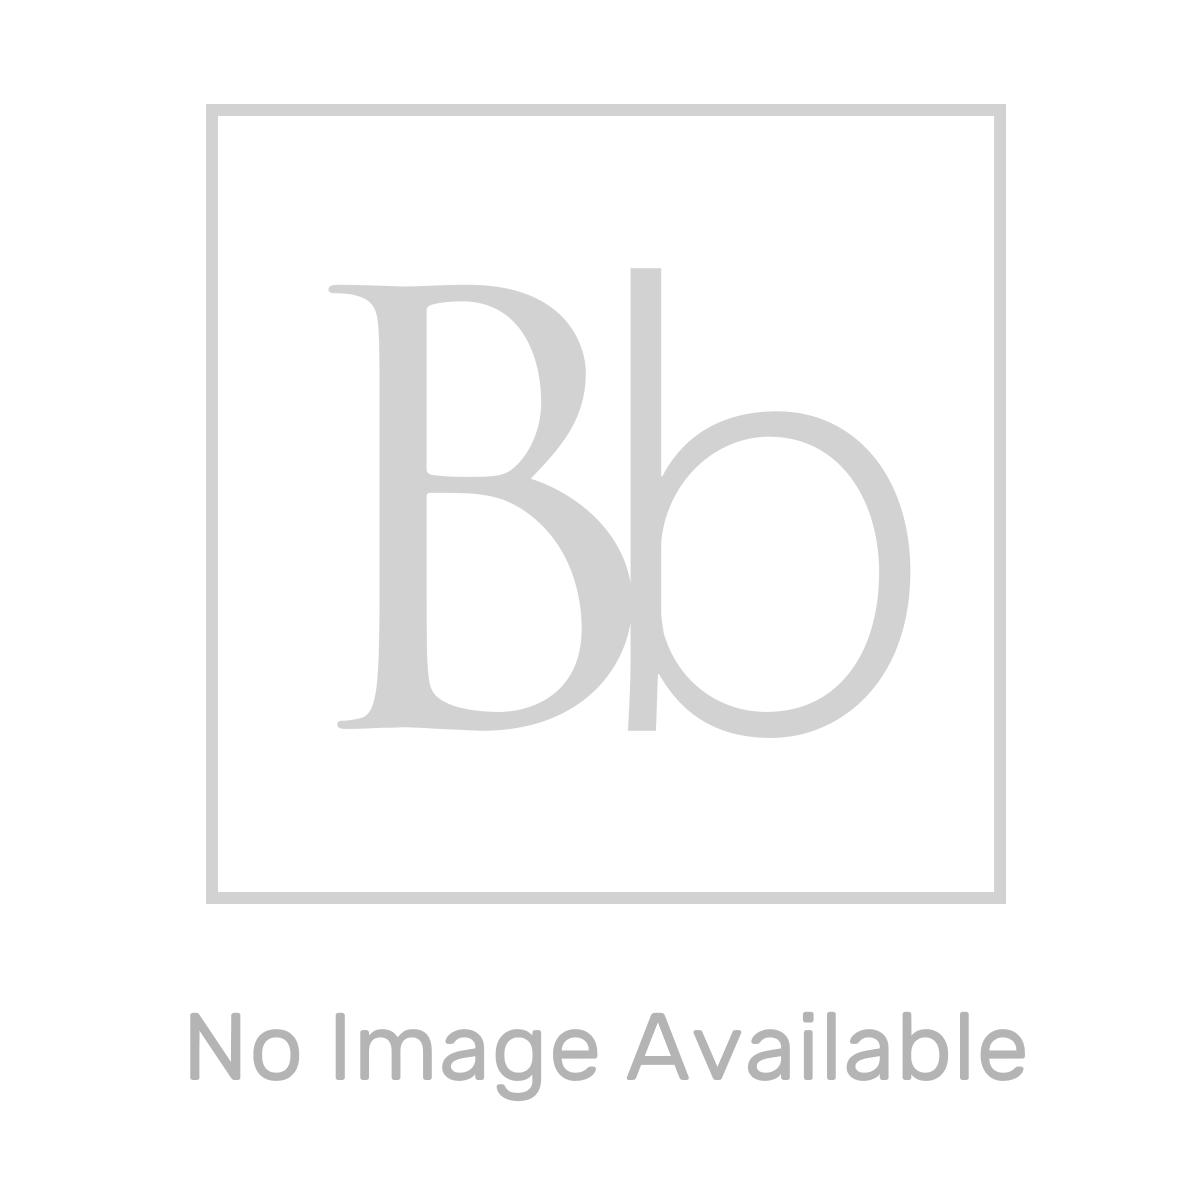 Frontline Emme Gloss White Vanity Unit Measurements